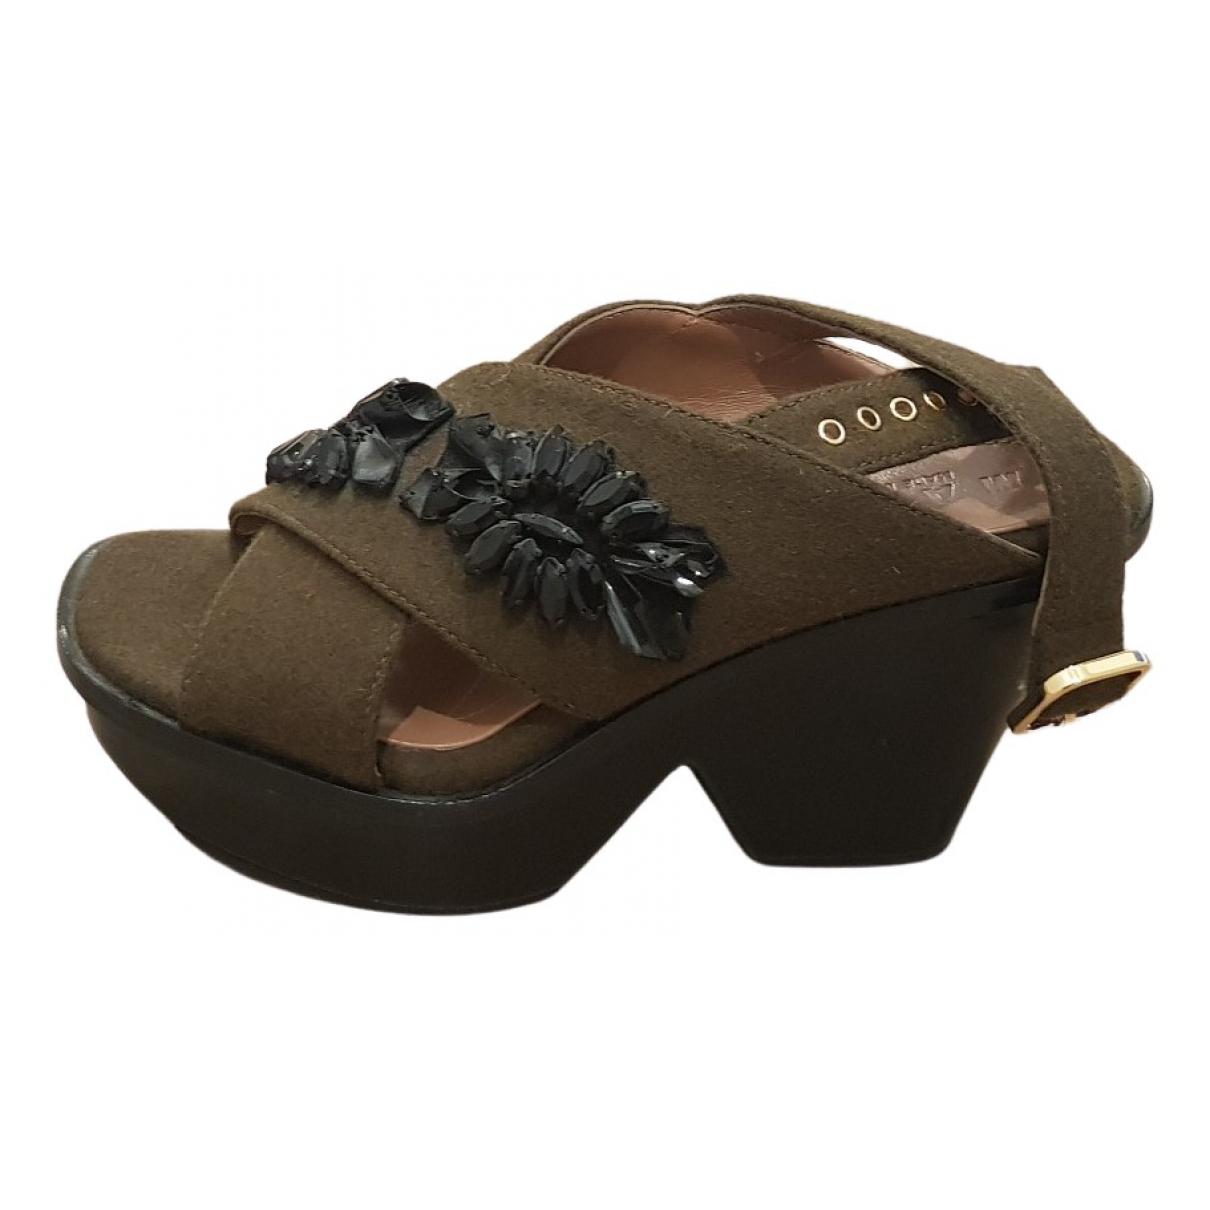 Marni N Khaki Glitter Sandals for Women 37 EU